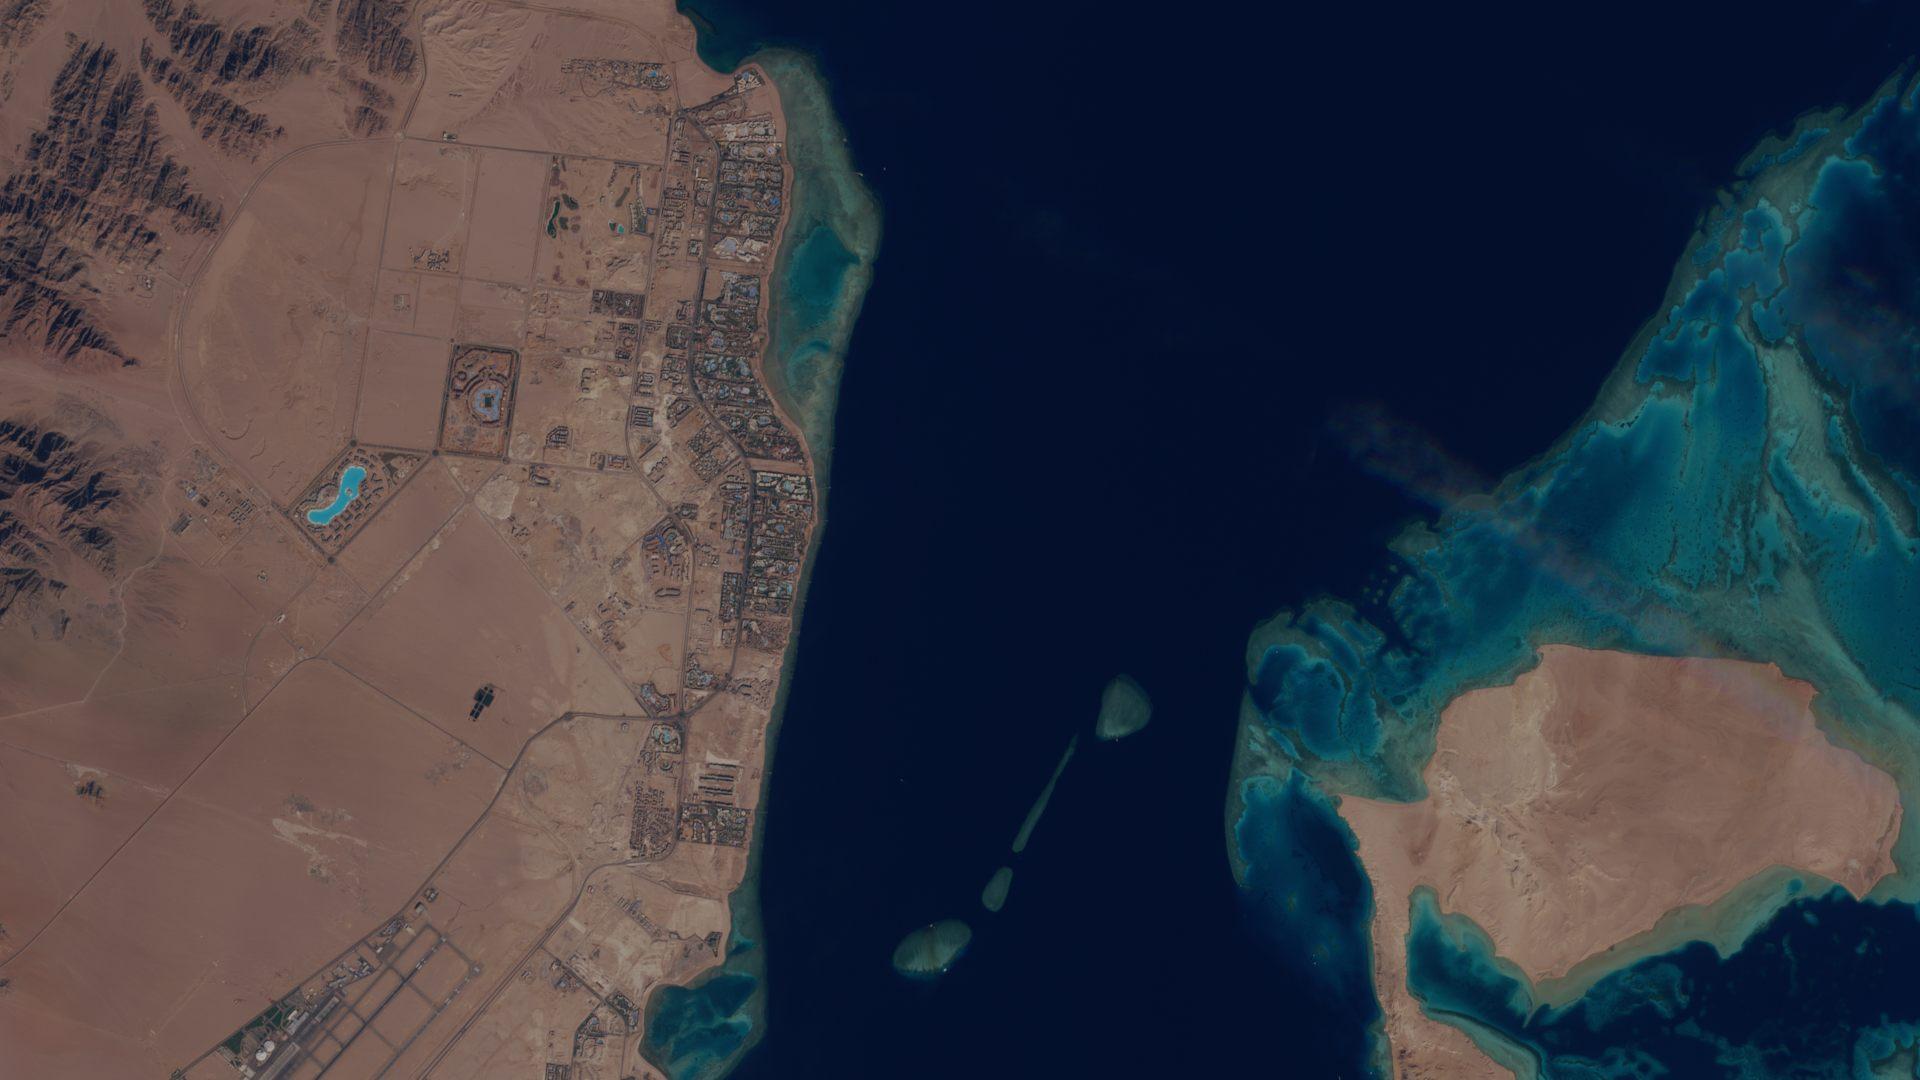 Egypte - Mer rouge - Sinaï - Charm el-Cheikh - Baie de Naama - satellite Sentinel-2 - MSI - ESA - Tourisme - Plongée sous-marine